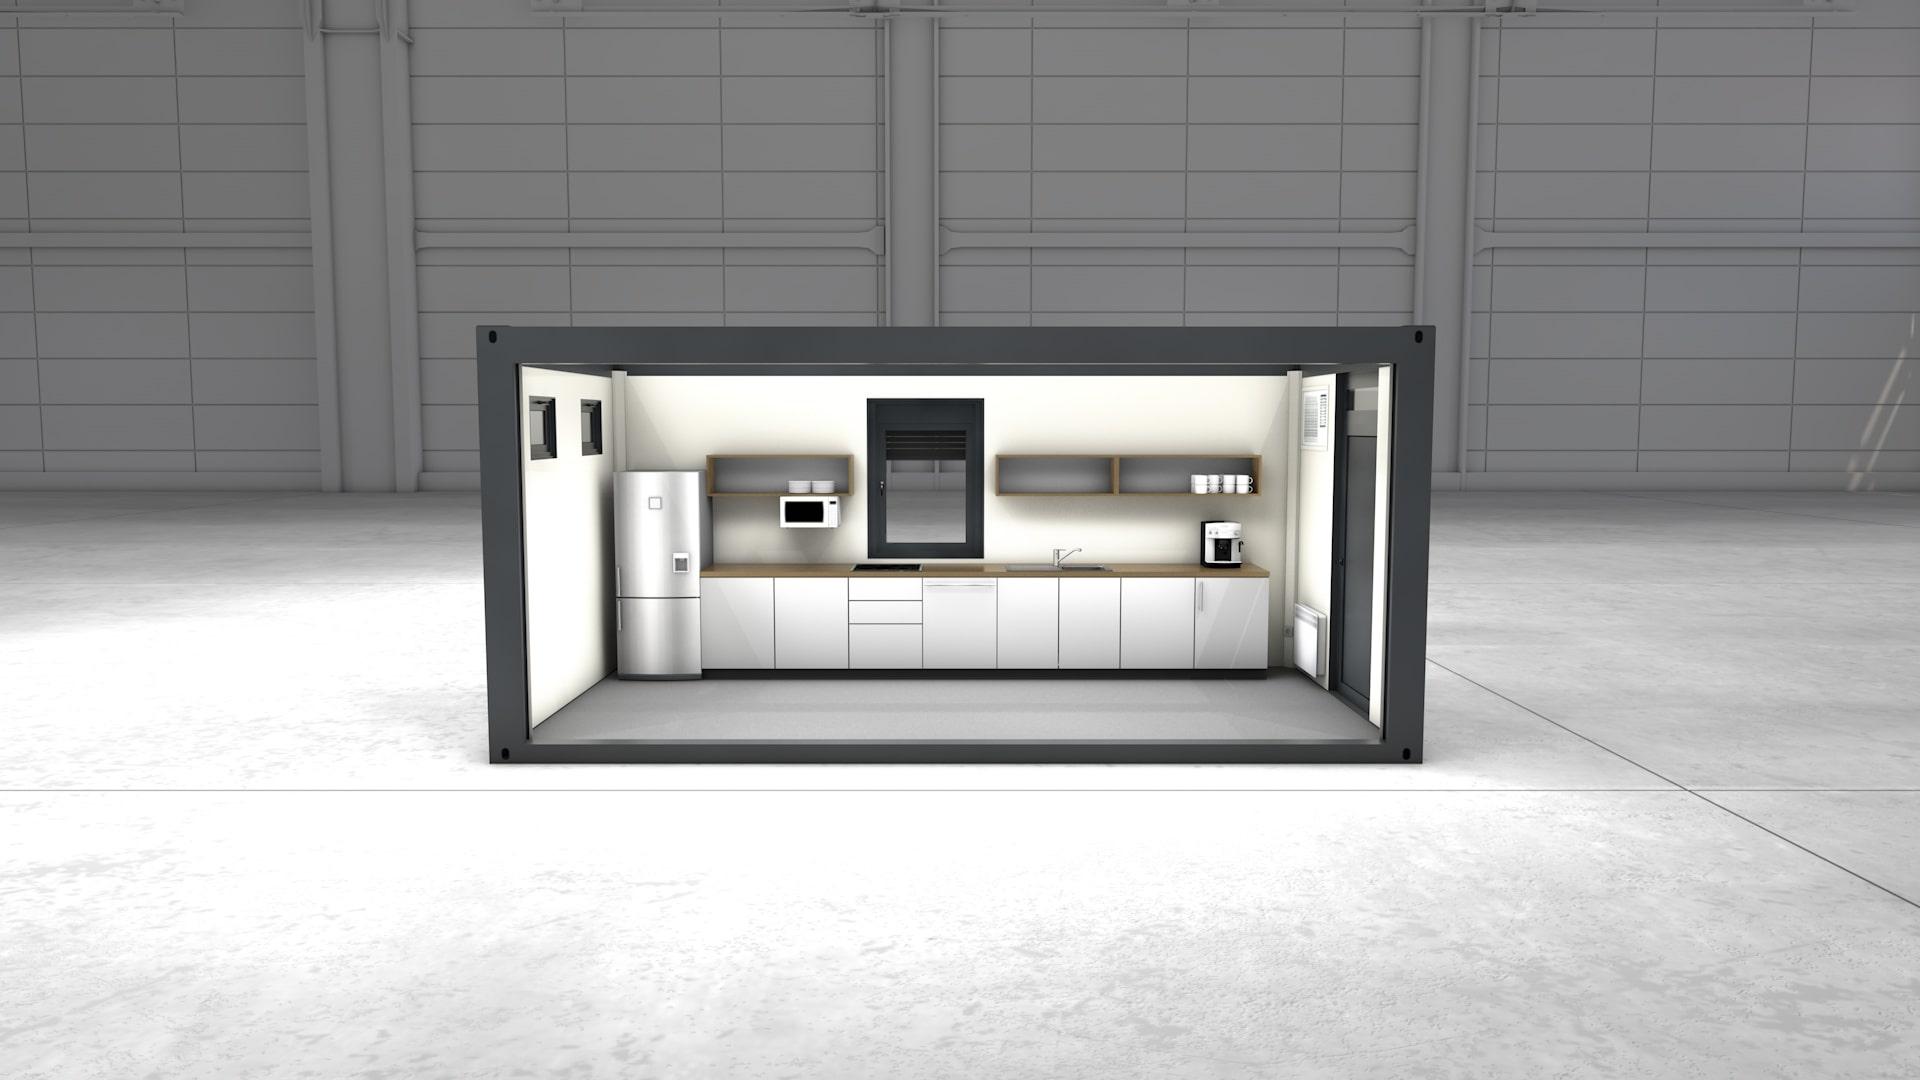 Container Modul 16 - Ansicht 7